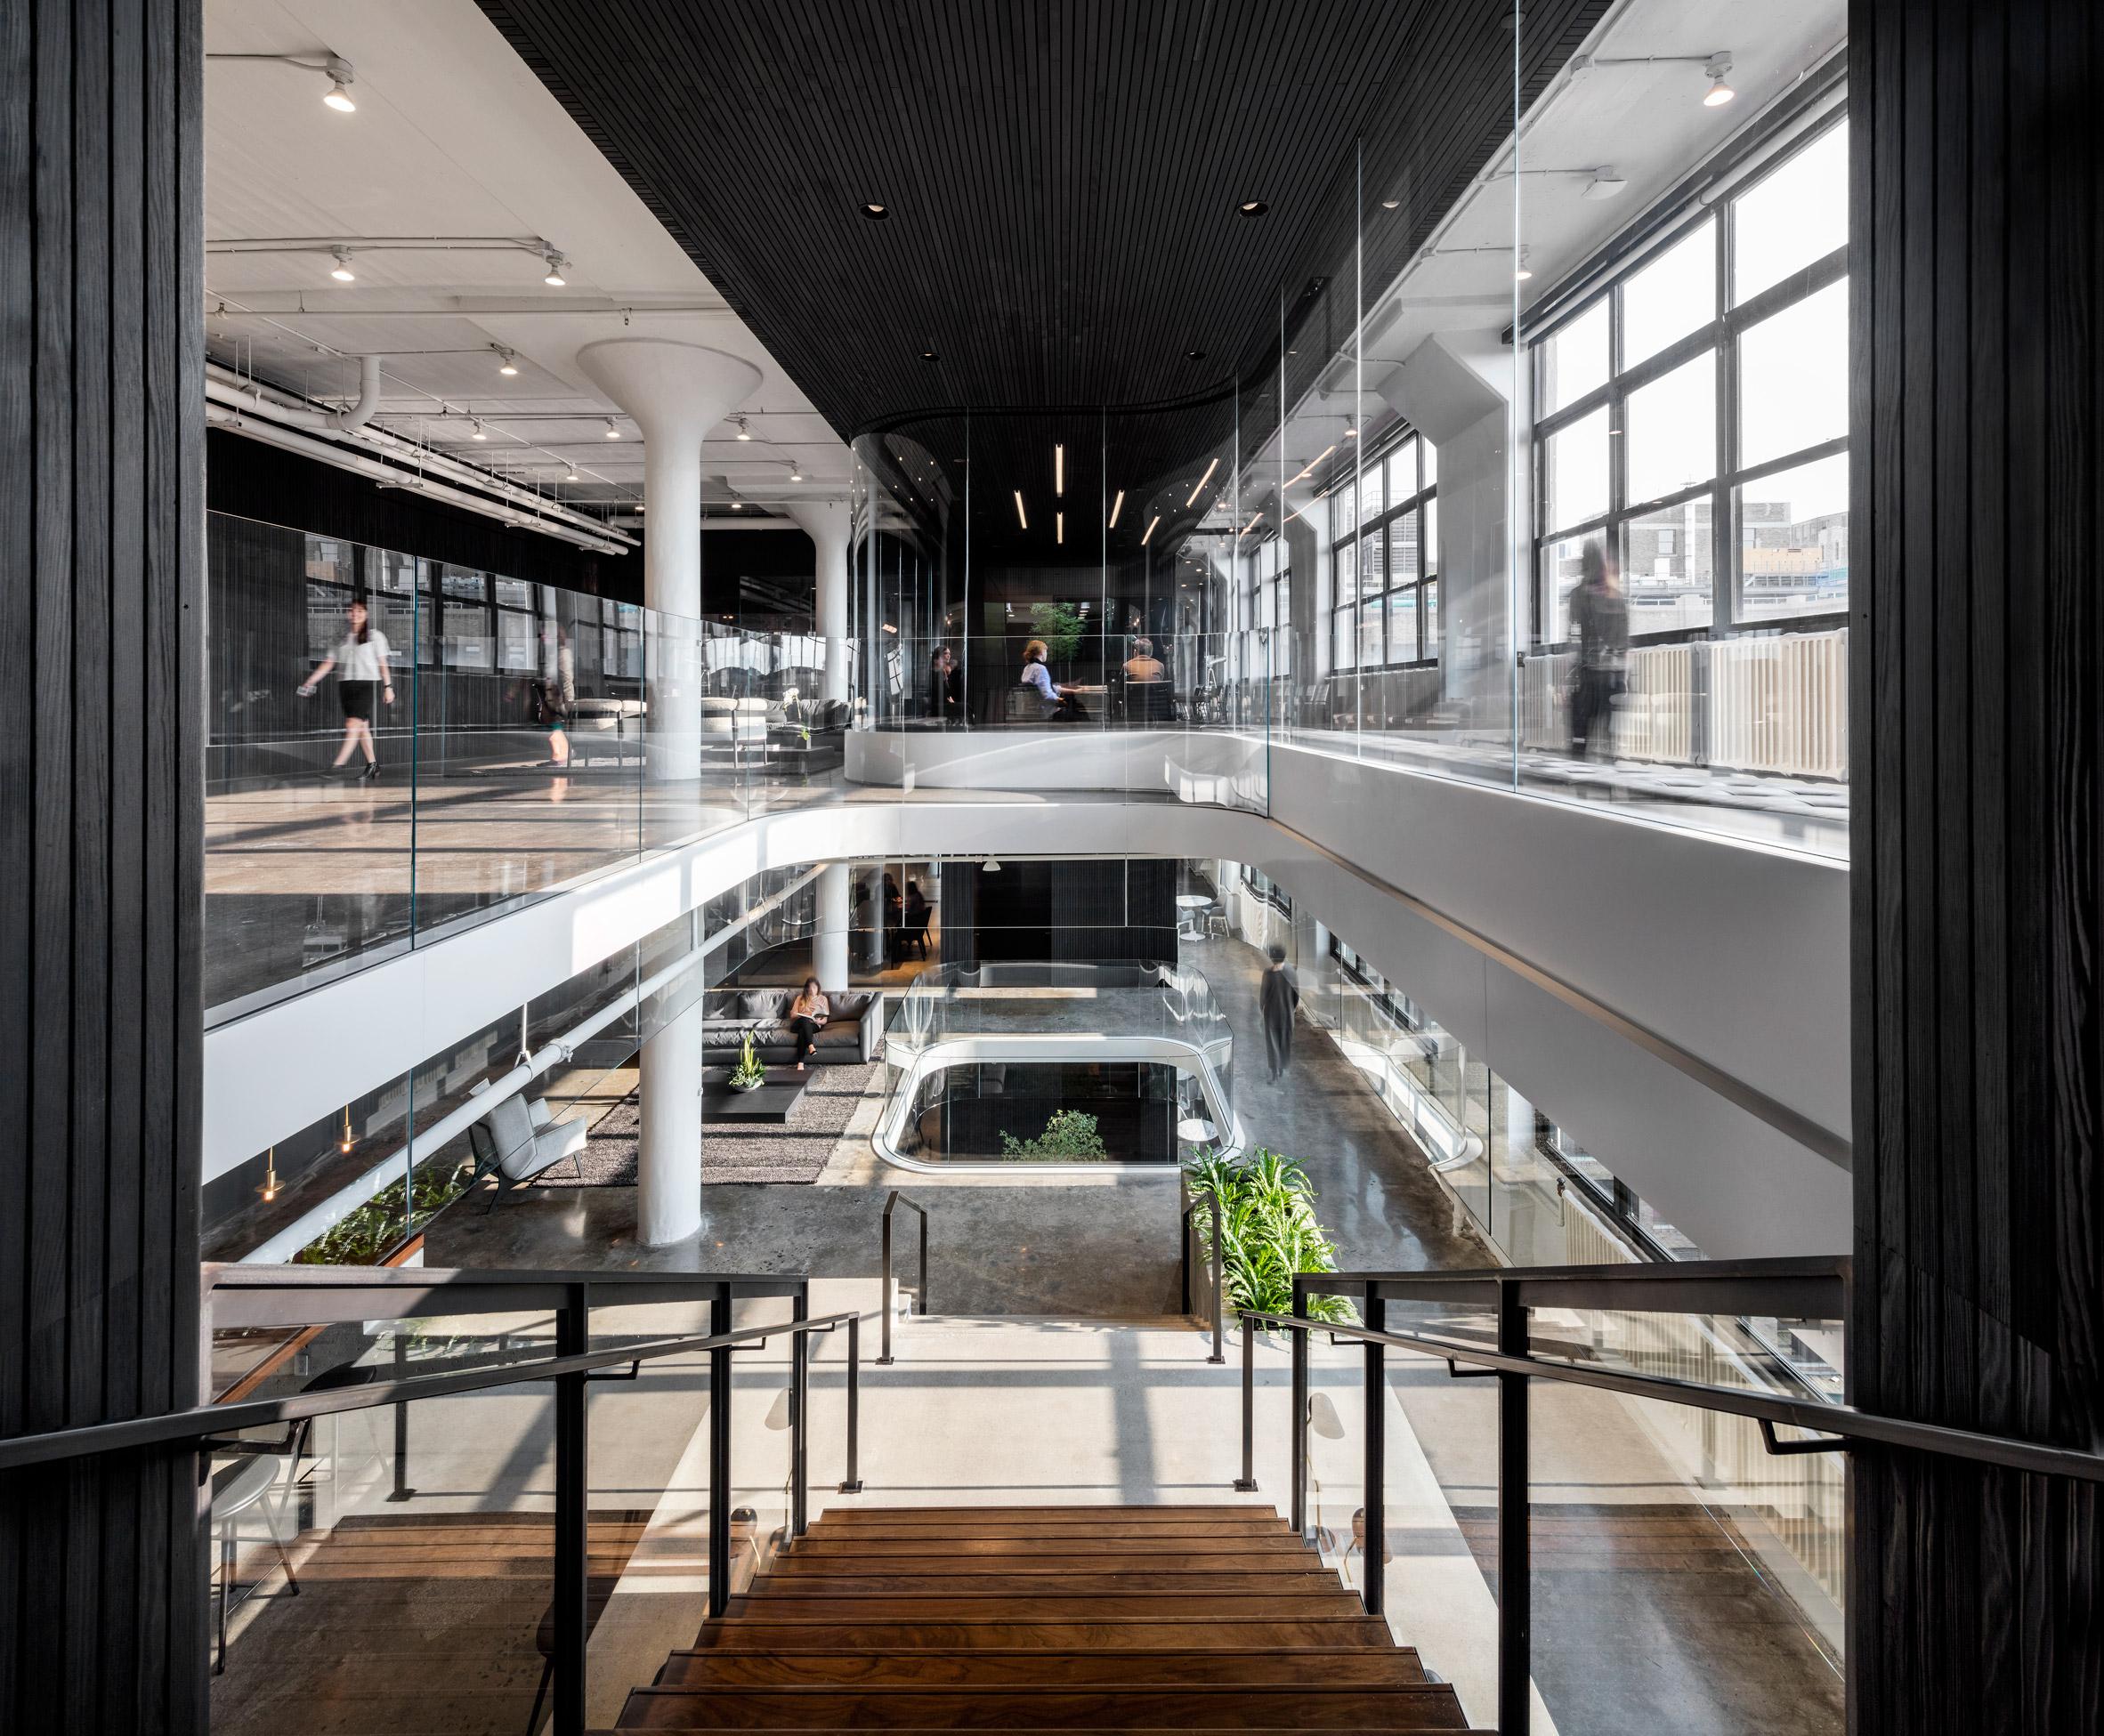 squarespace-offices-interior-design-print-shop-conversion-aplusi-a-and-i-new-york-usa_dezeen_2364_col_13